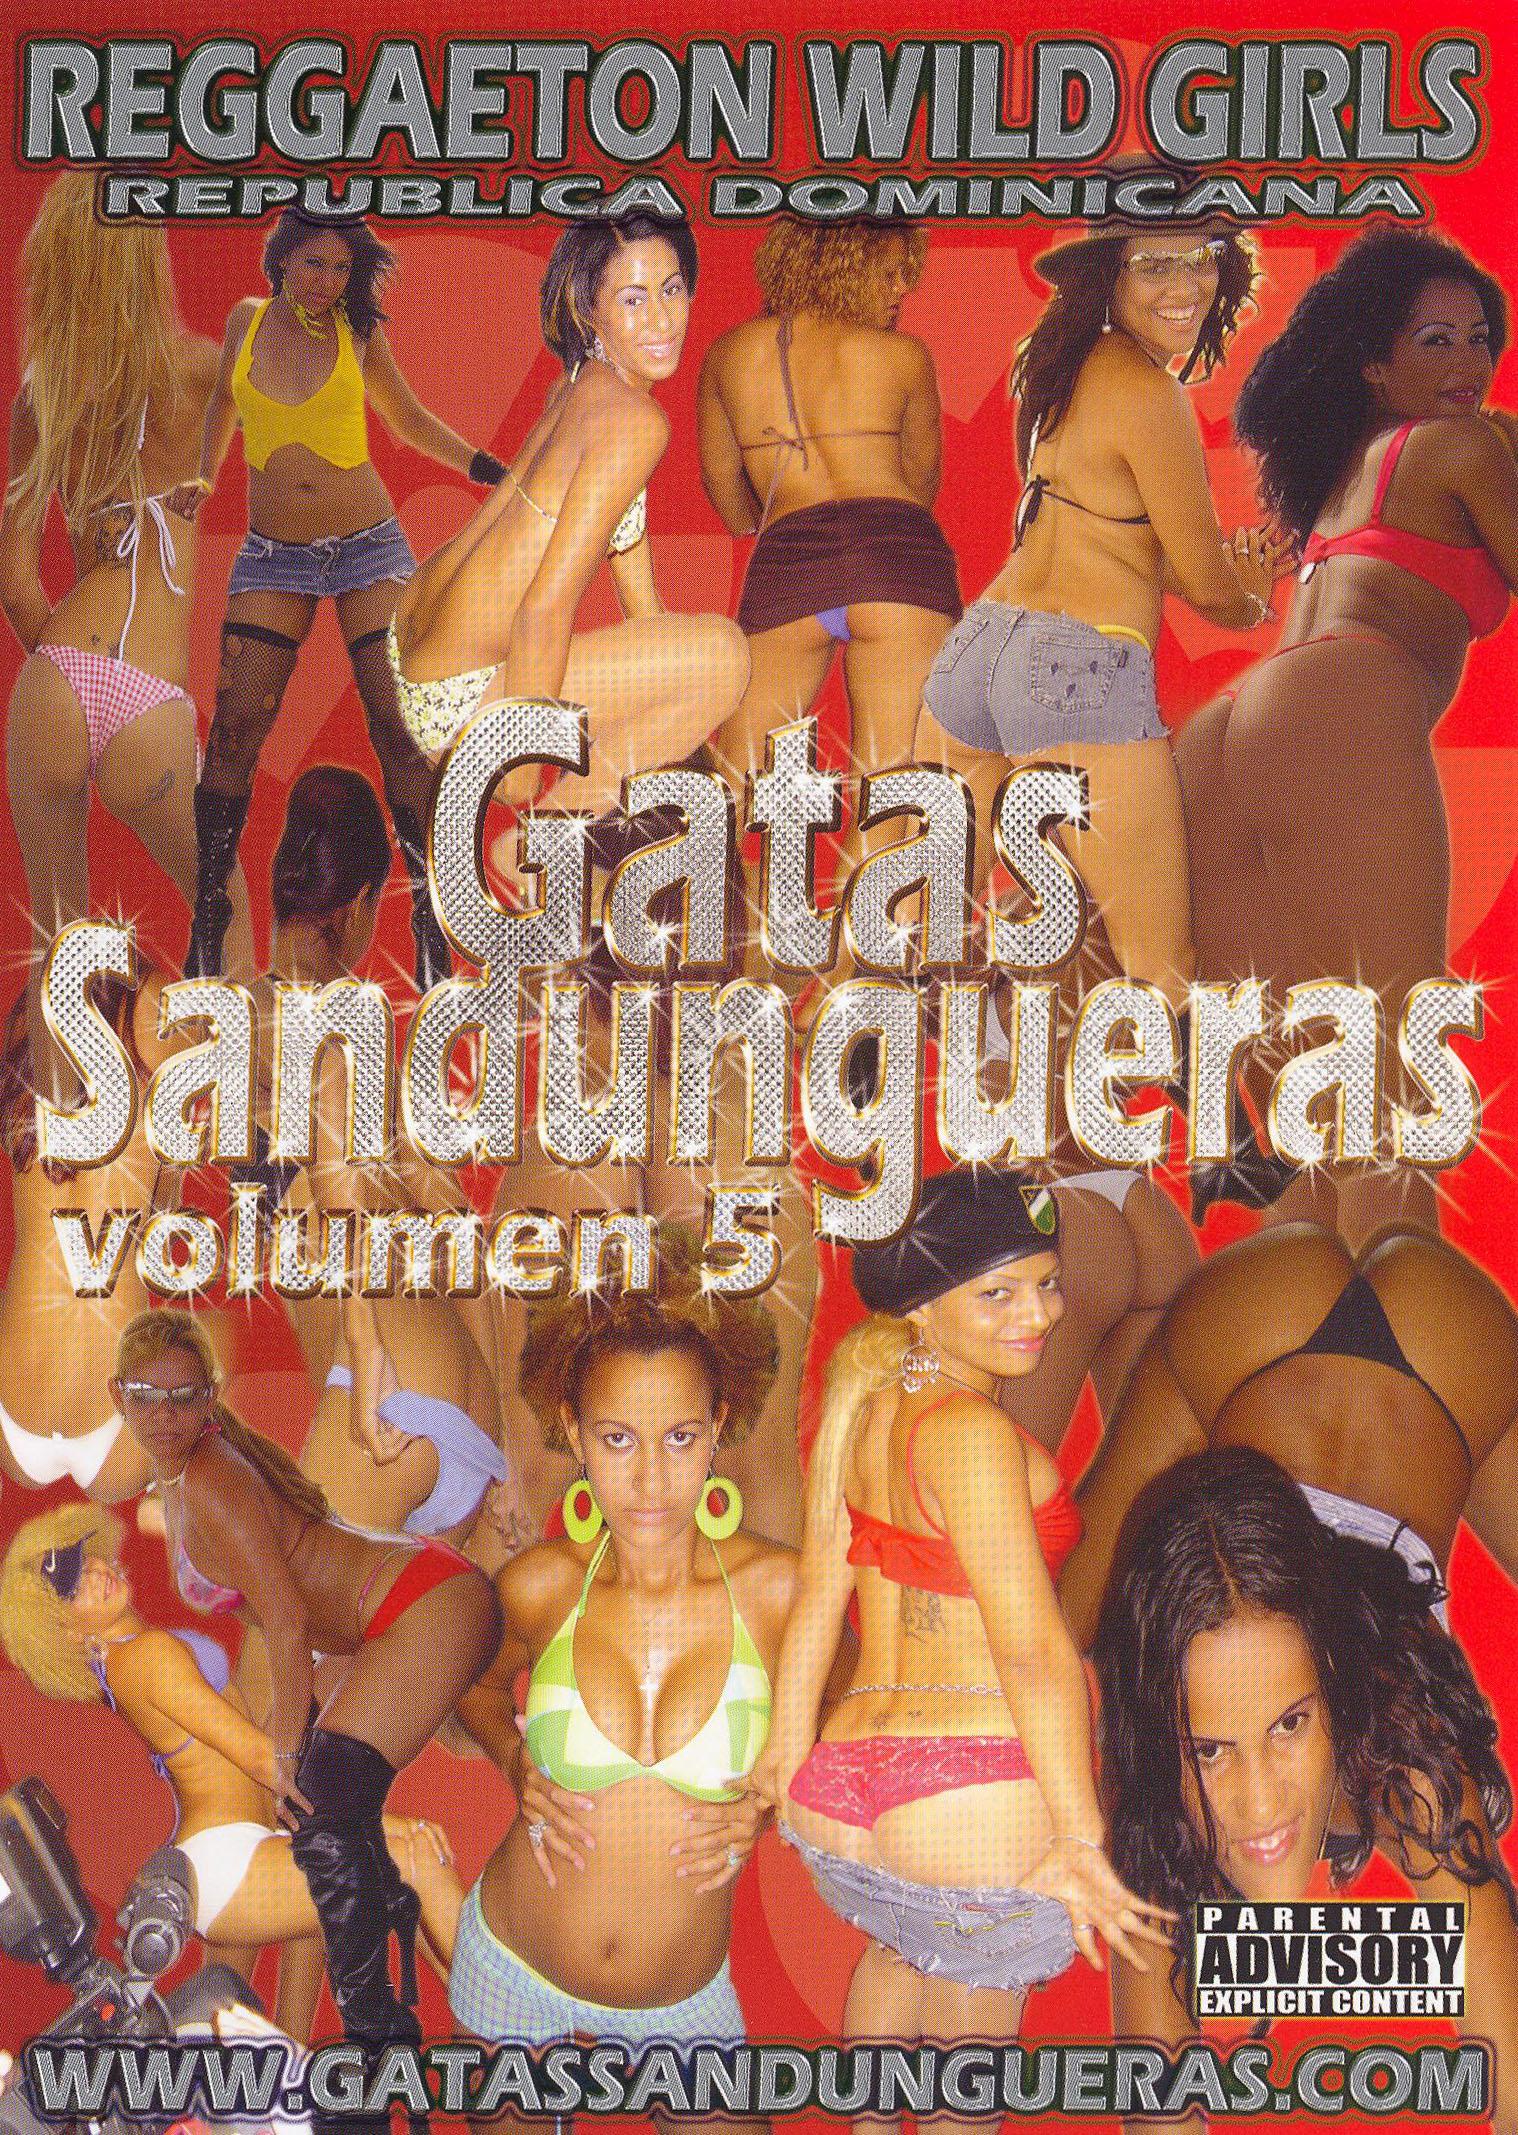 Gatas Sandungueras, Vol. 5: Reggaeton Wild Girls